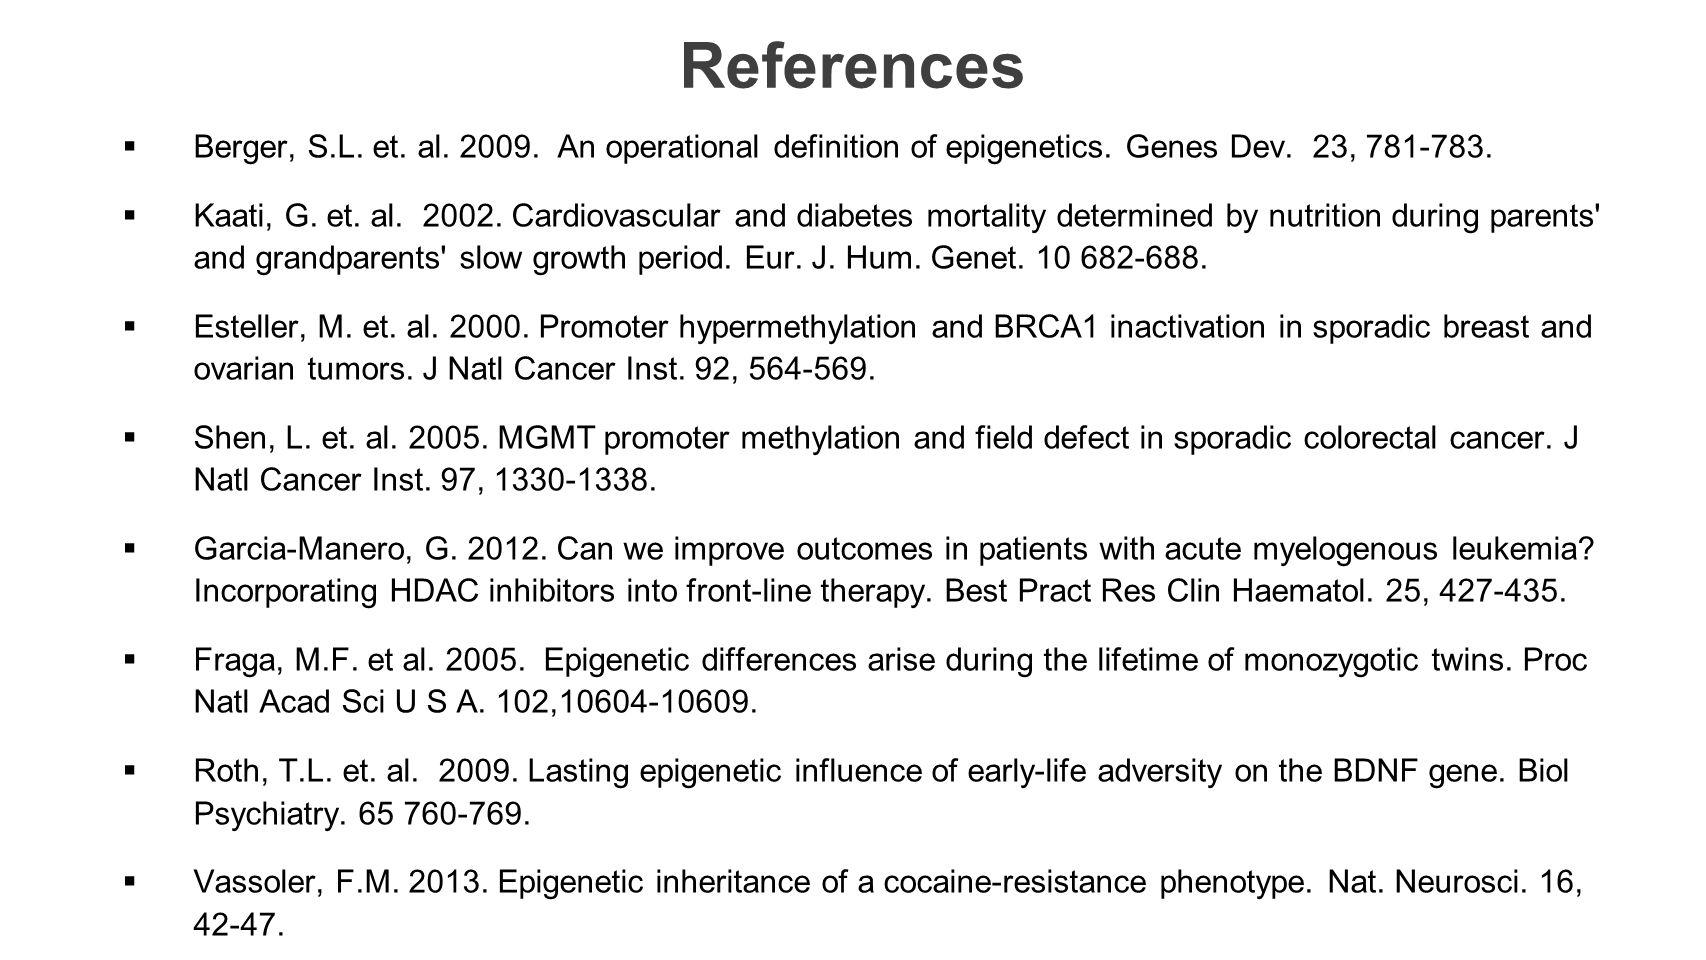 References Berger, S.L. et. al. 2009. An operational definition of epigenetics. Genes Dev. 23, 781-783.